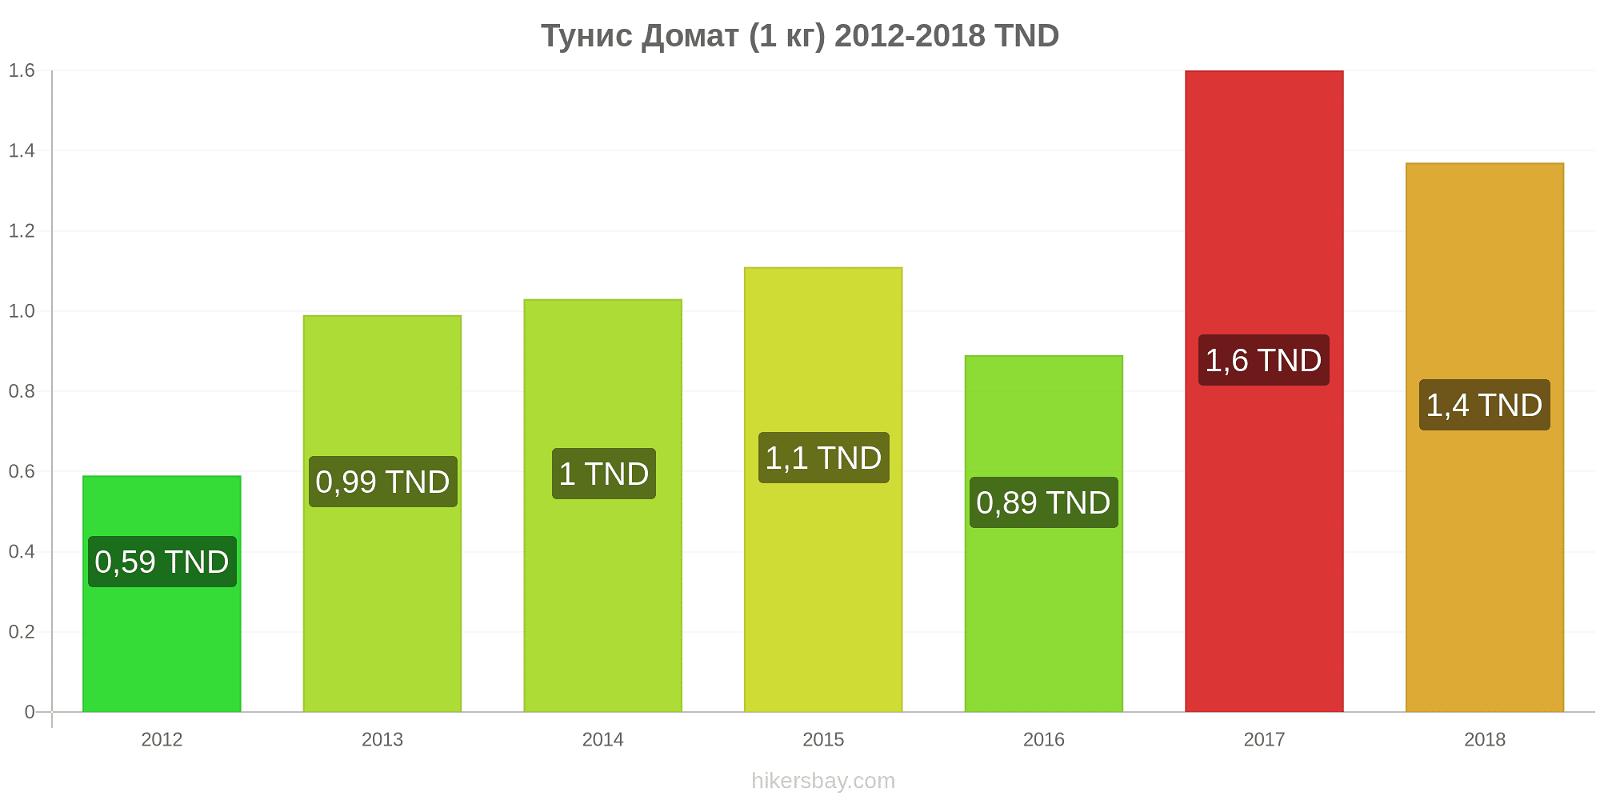 Тунис ценови промени Домат (1 кг) hikersbay.com